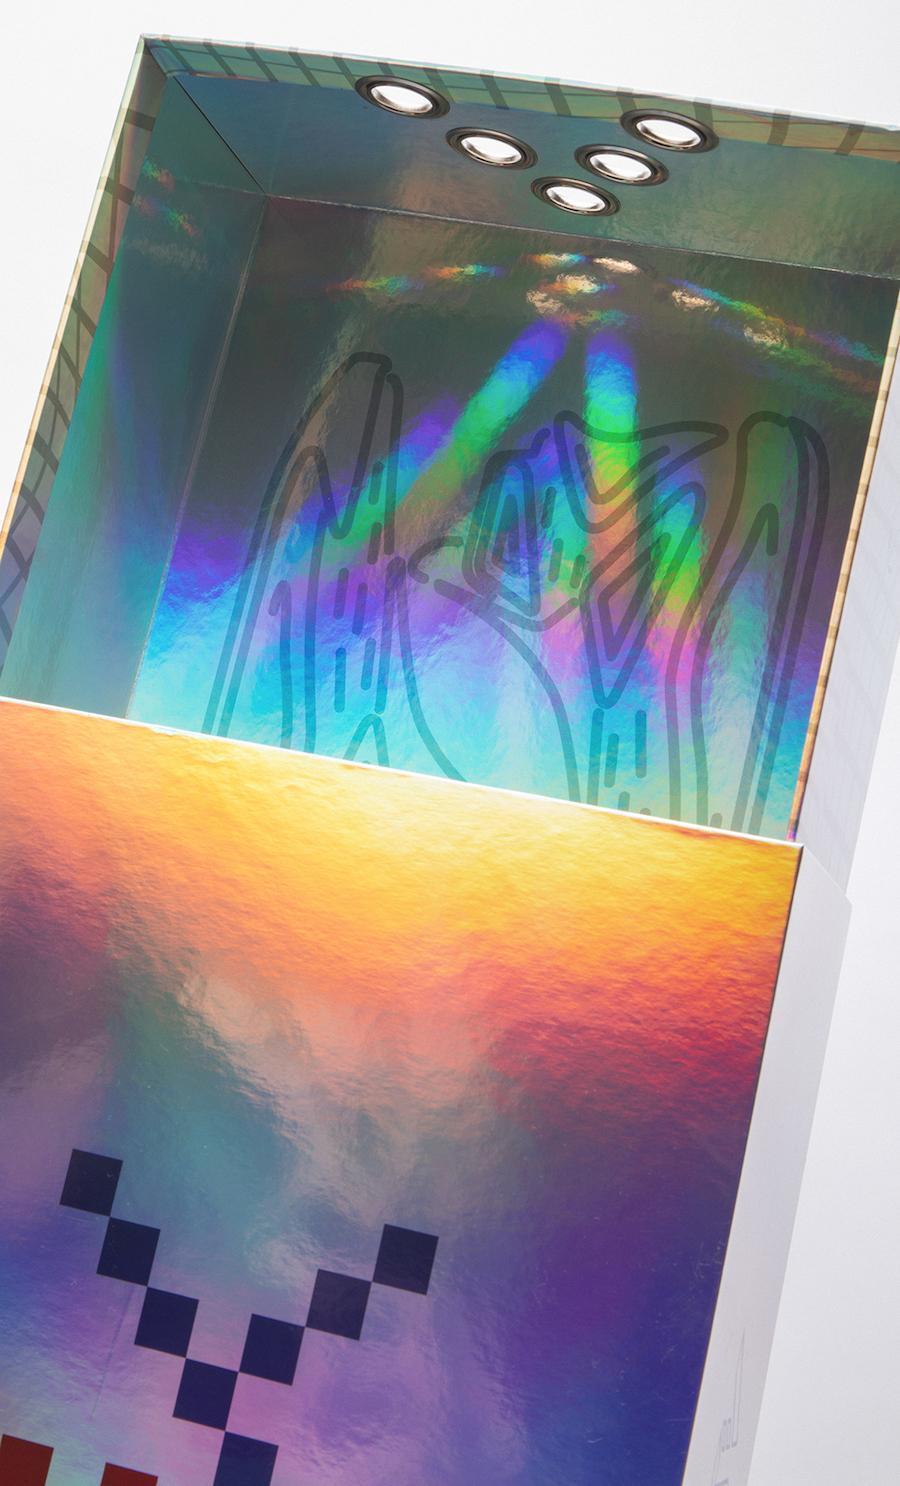 ANTA KT5 Disco Ball Release Date Info